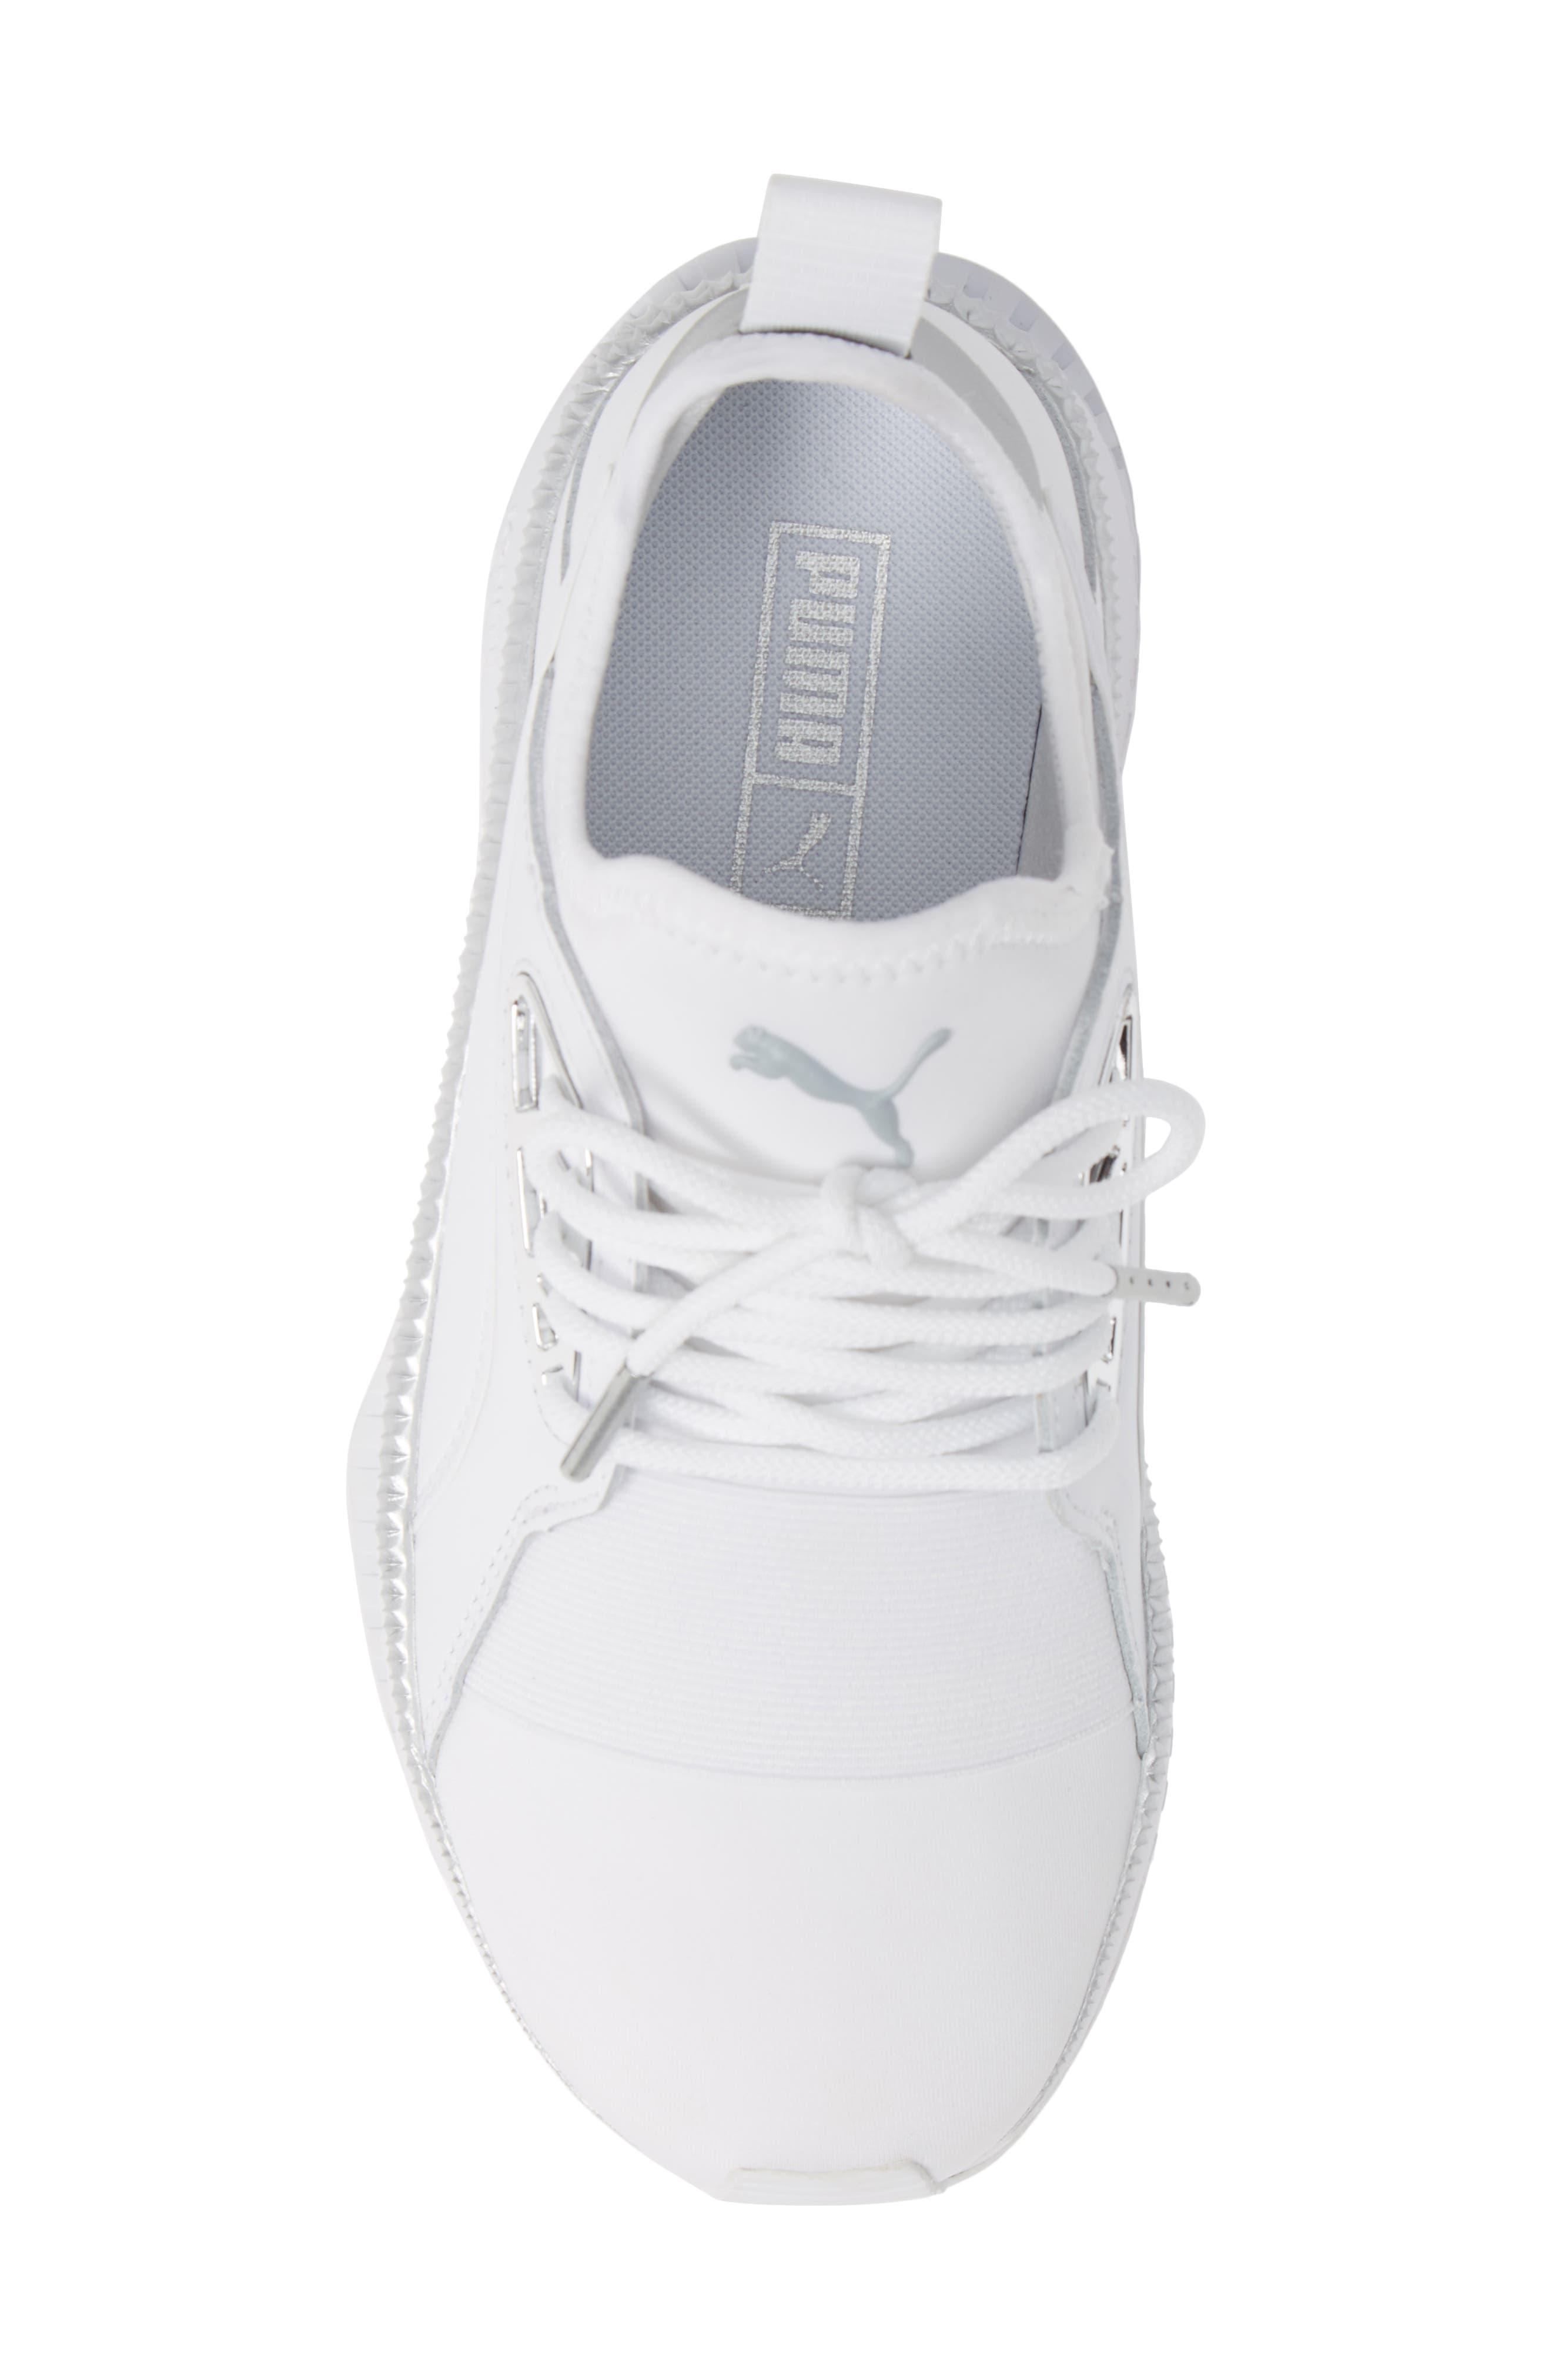 TSUGI Apex Jewel Sneaker,                             Alternate thumbnail 5, color,                             PUMA WHITE/ PUMA WHITE